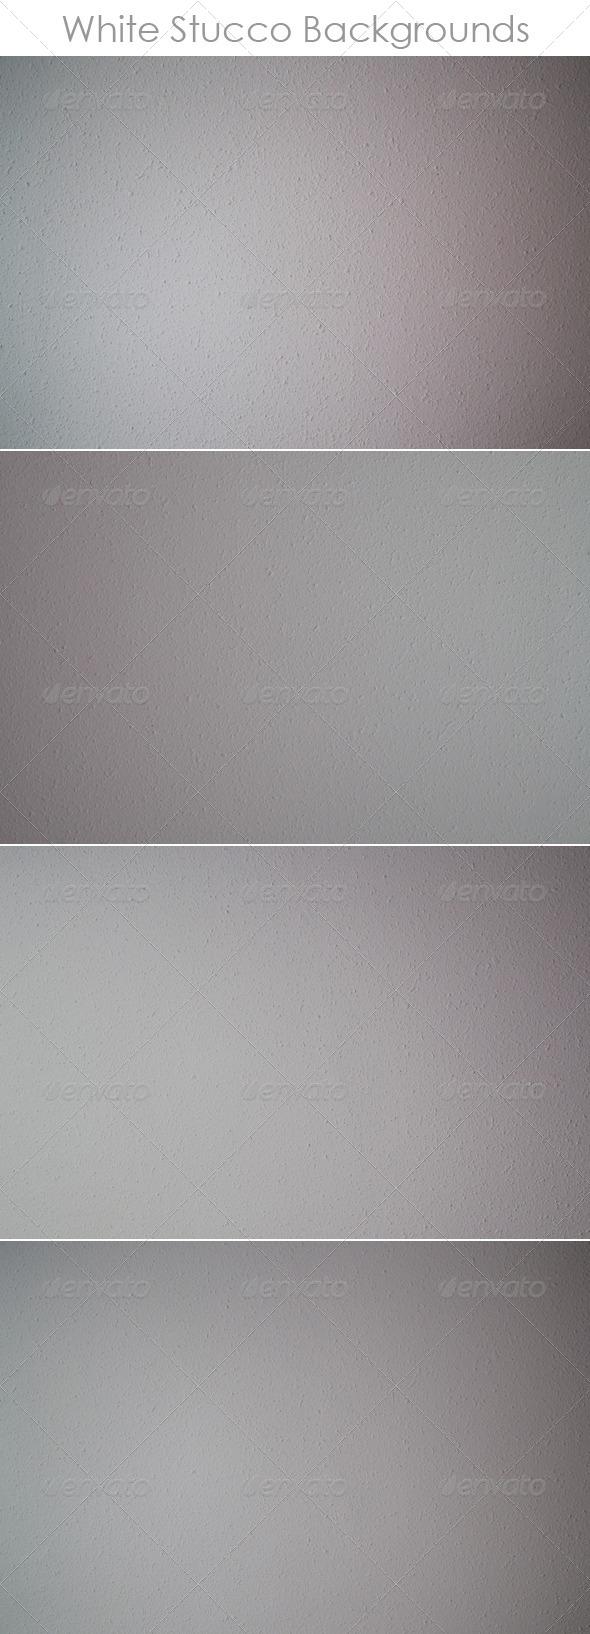 White Stucco Backgrounds - Concrete Textures